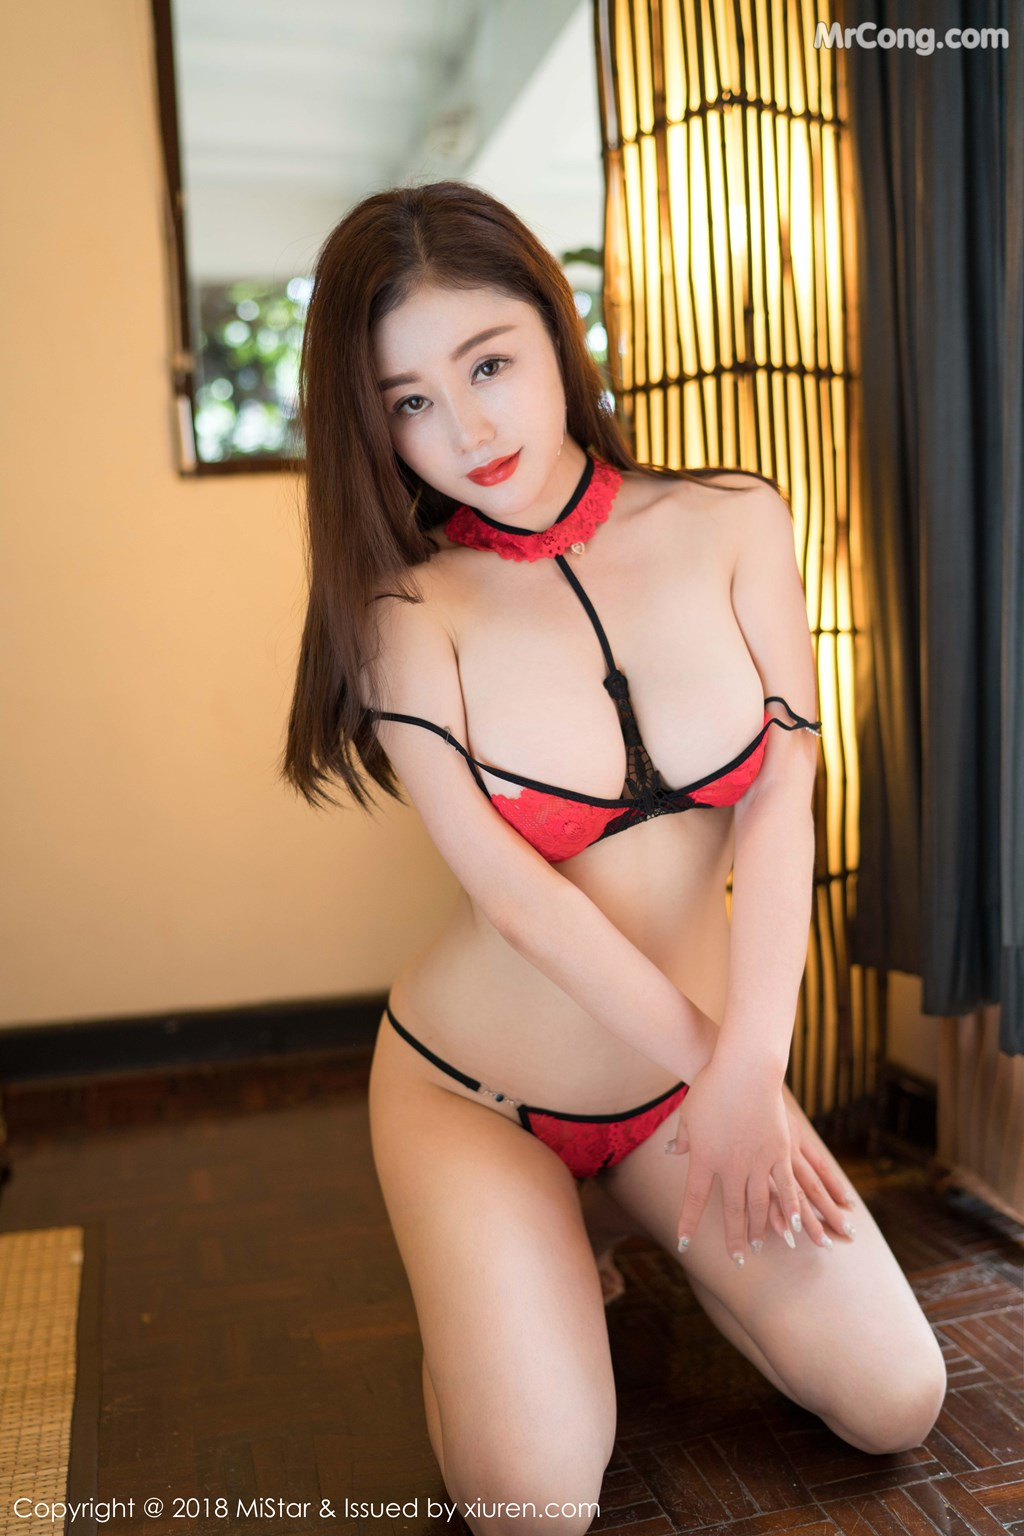 Image MiStar-Vol.226-Xue-Qian-Zi-MrCong.com-008 in post MiStar Vol.226: Người mẫu Xue Qian Zi (雪千紫) (31 ảnh)